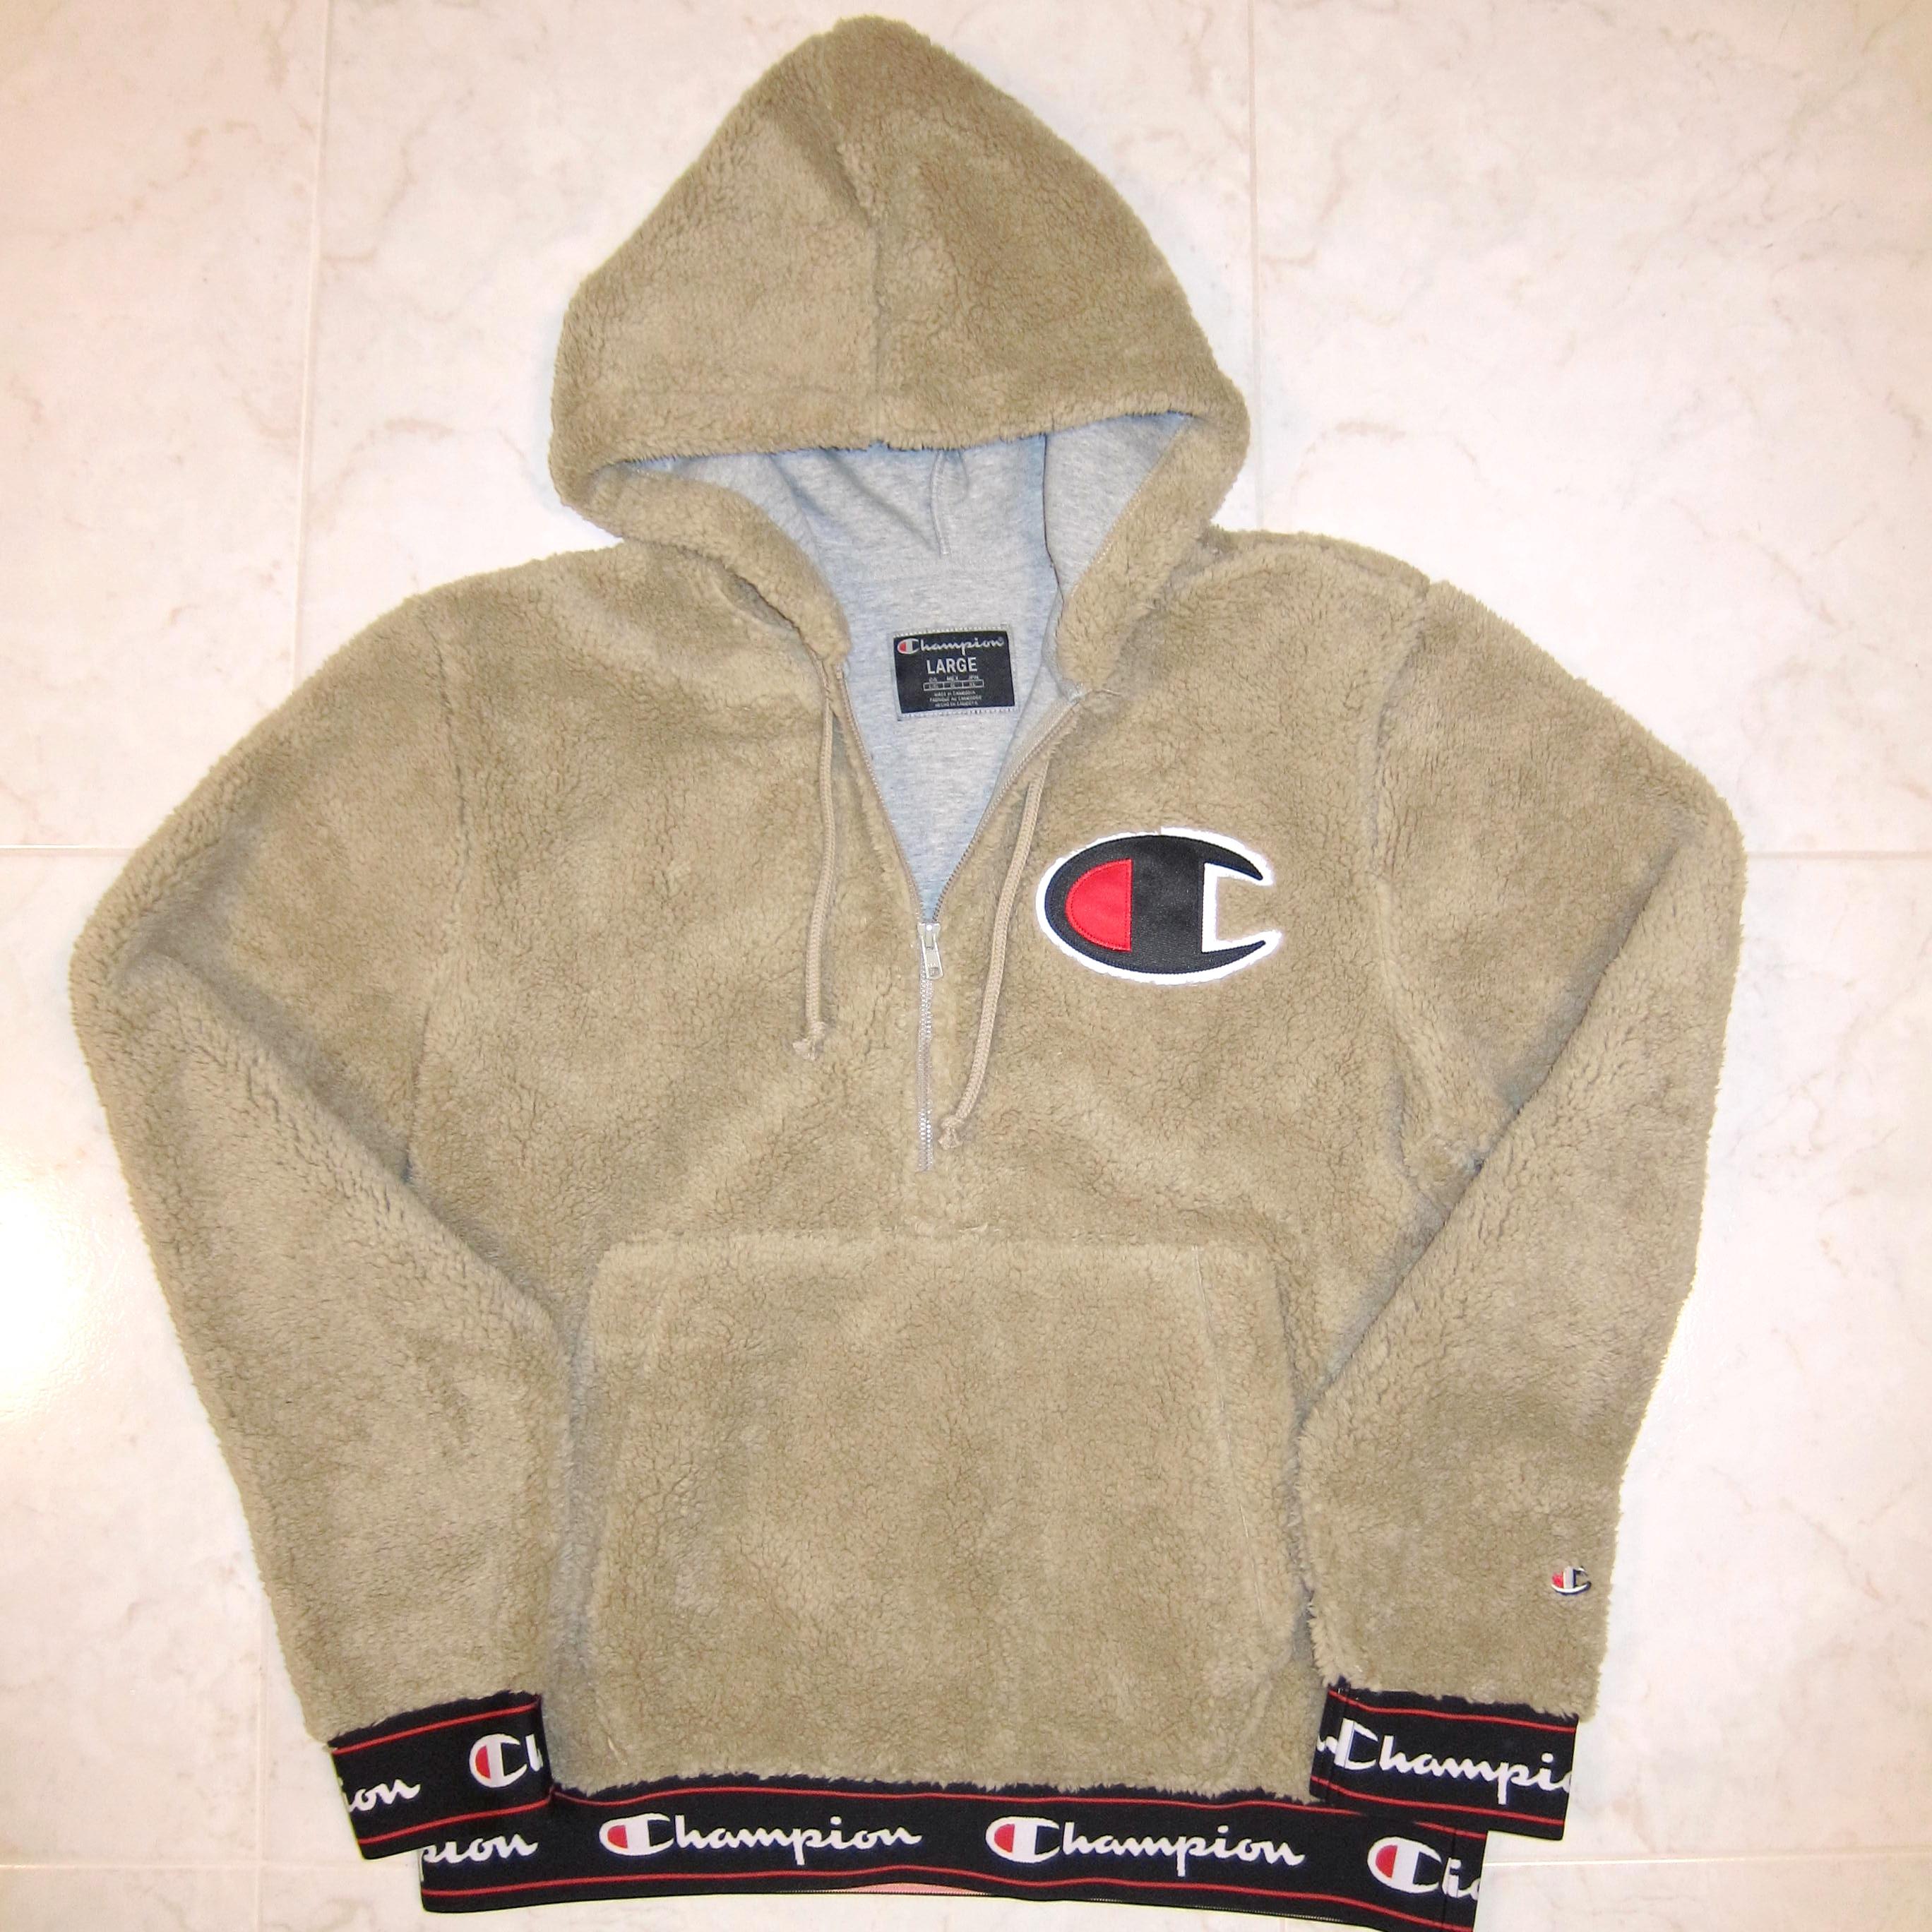 494f3d436149 Champion Champion Life Khaki Sherpa Pullover Half Zip Hoodie Sweatshirt  Size l - Sweatshirts   Hoodies for Sale - Grailed